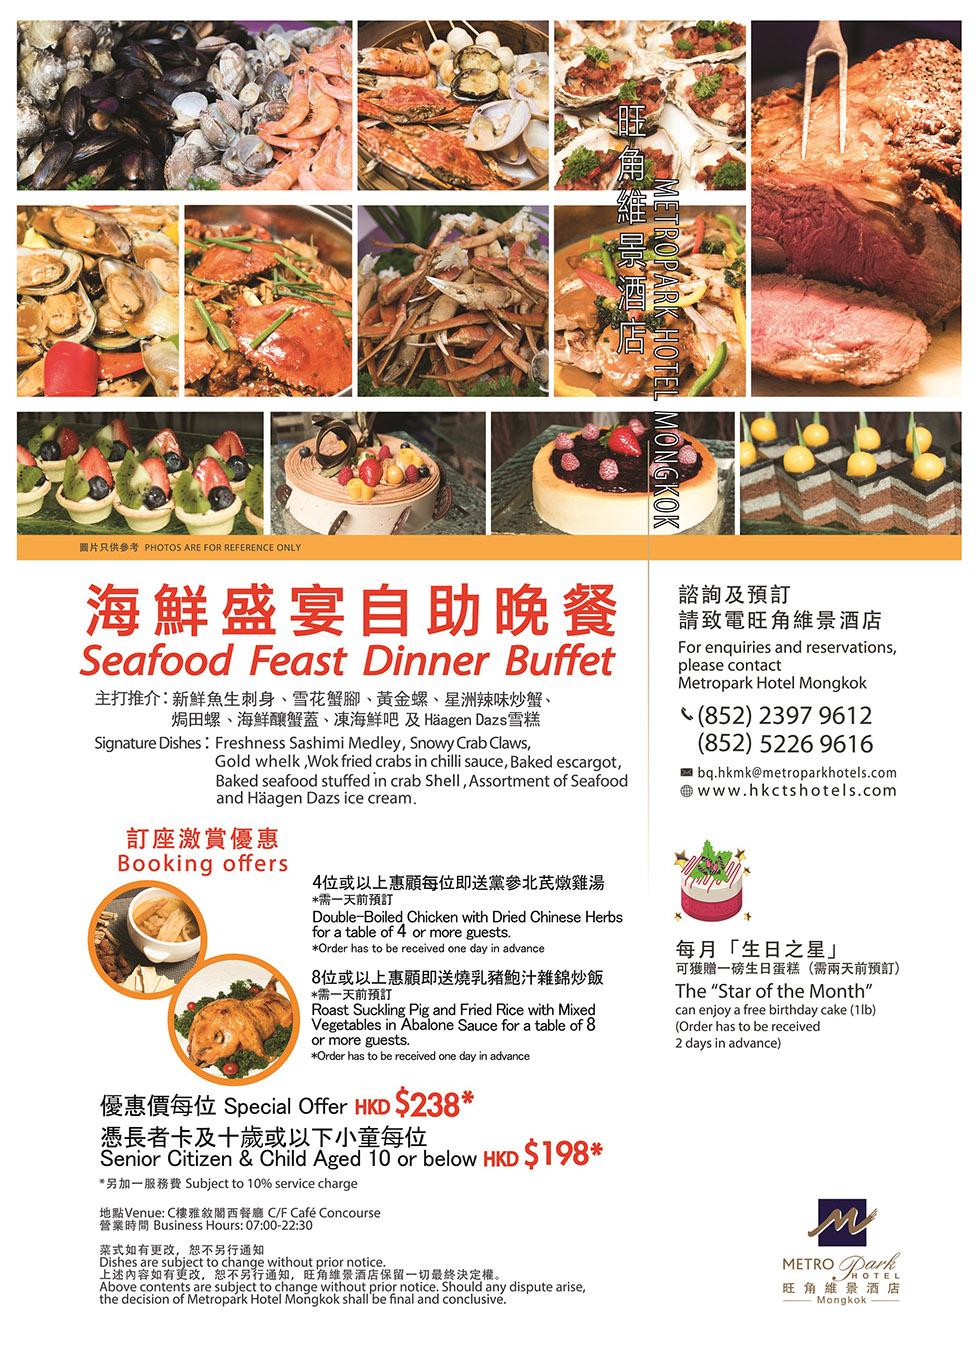 promotion promotion metropark hotel mongkok